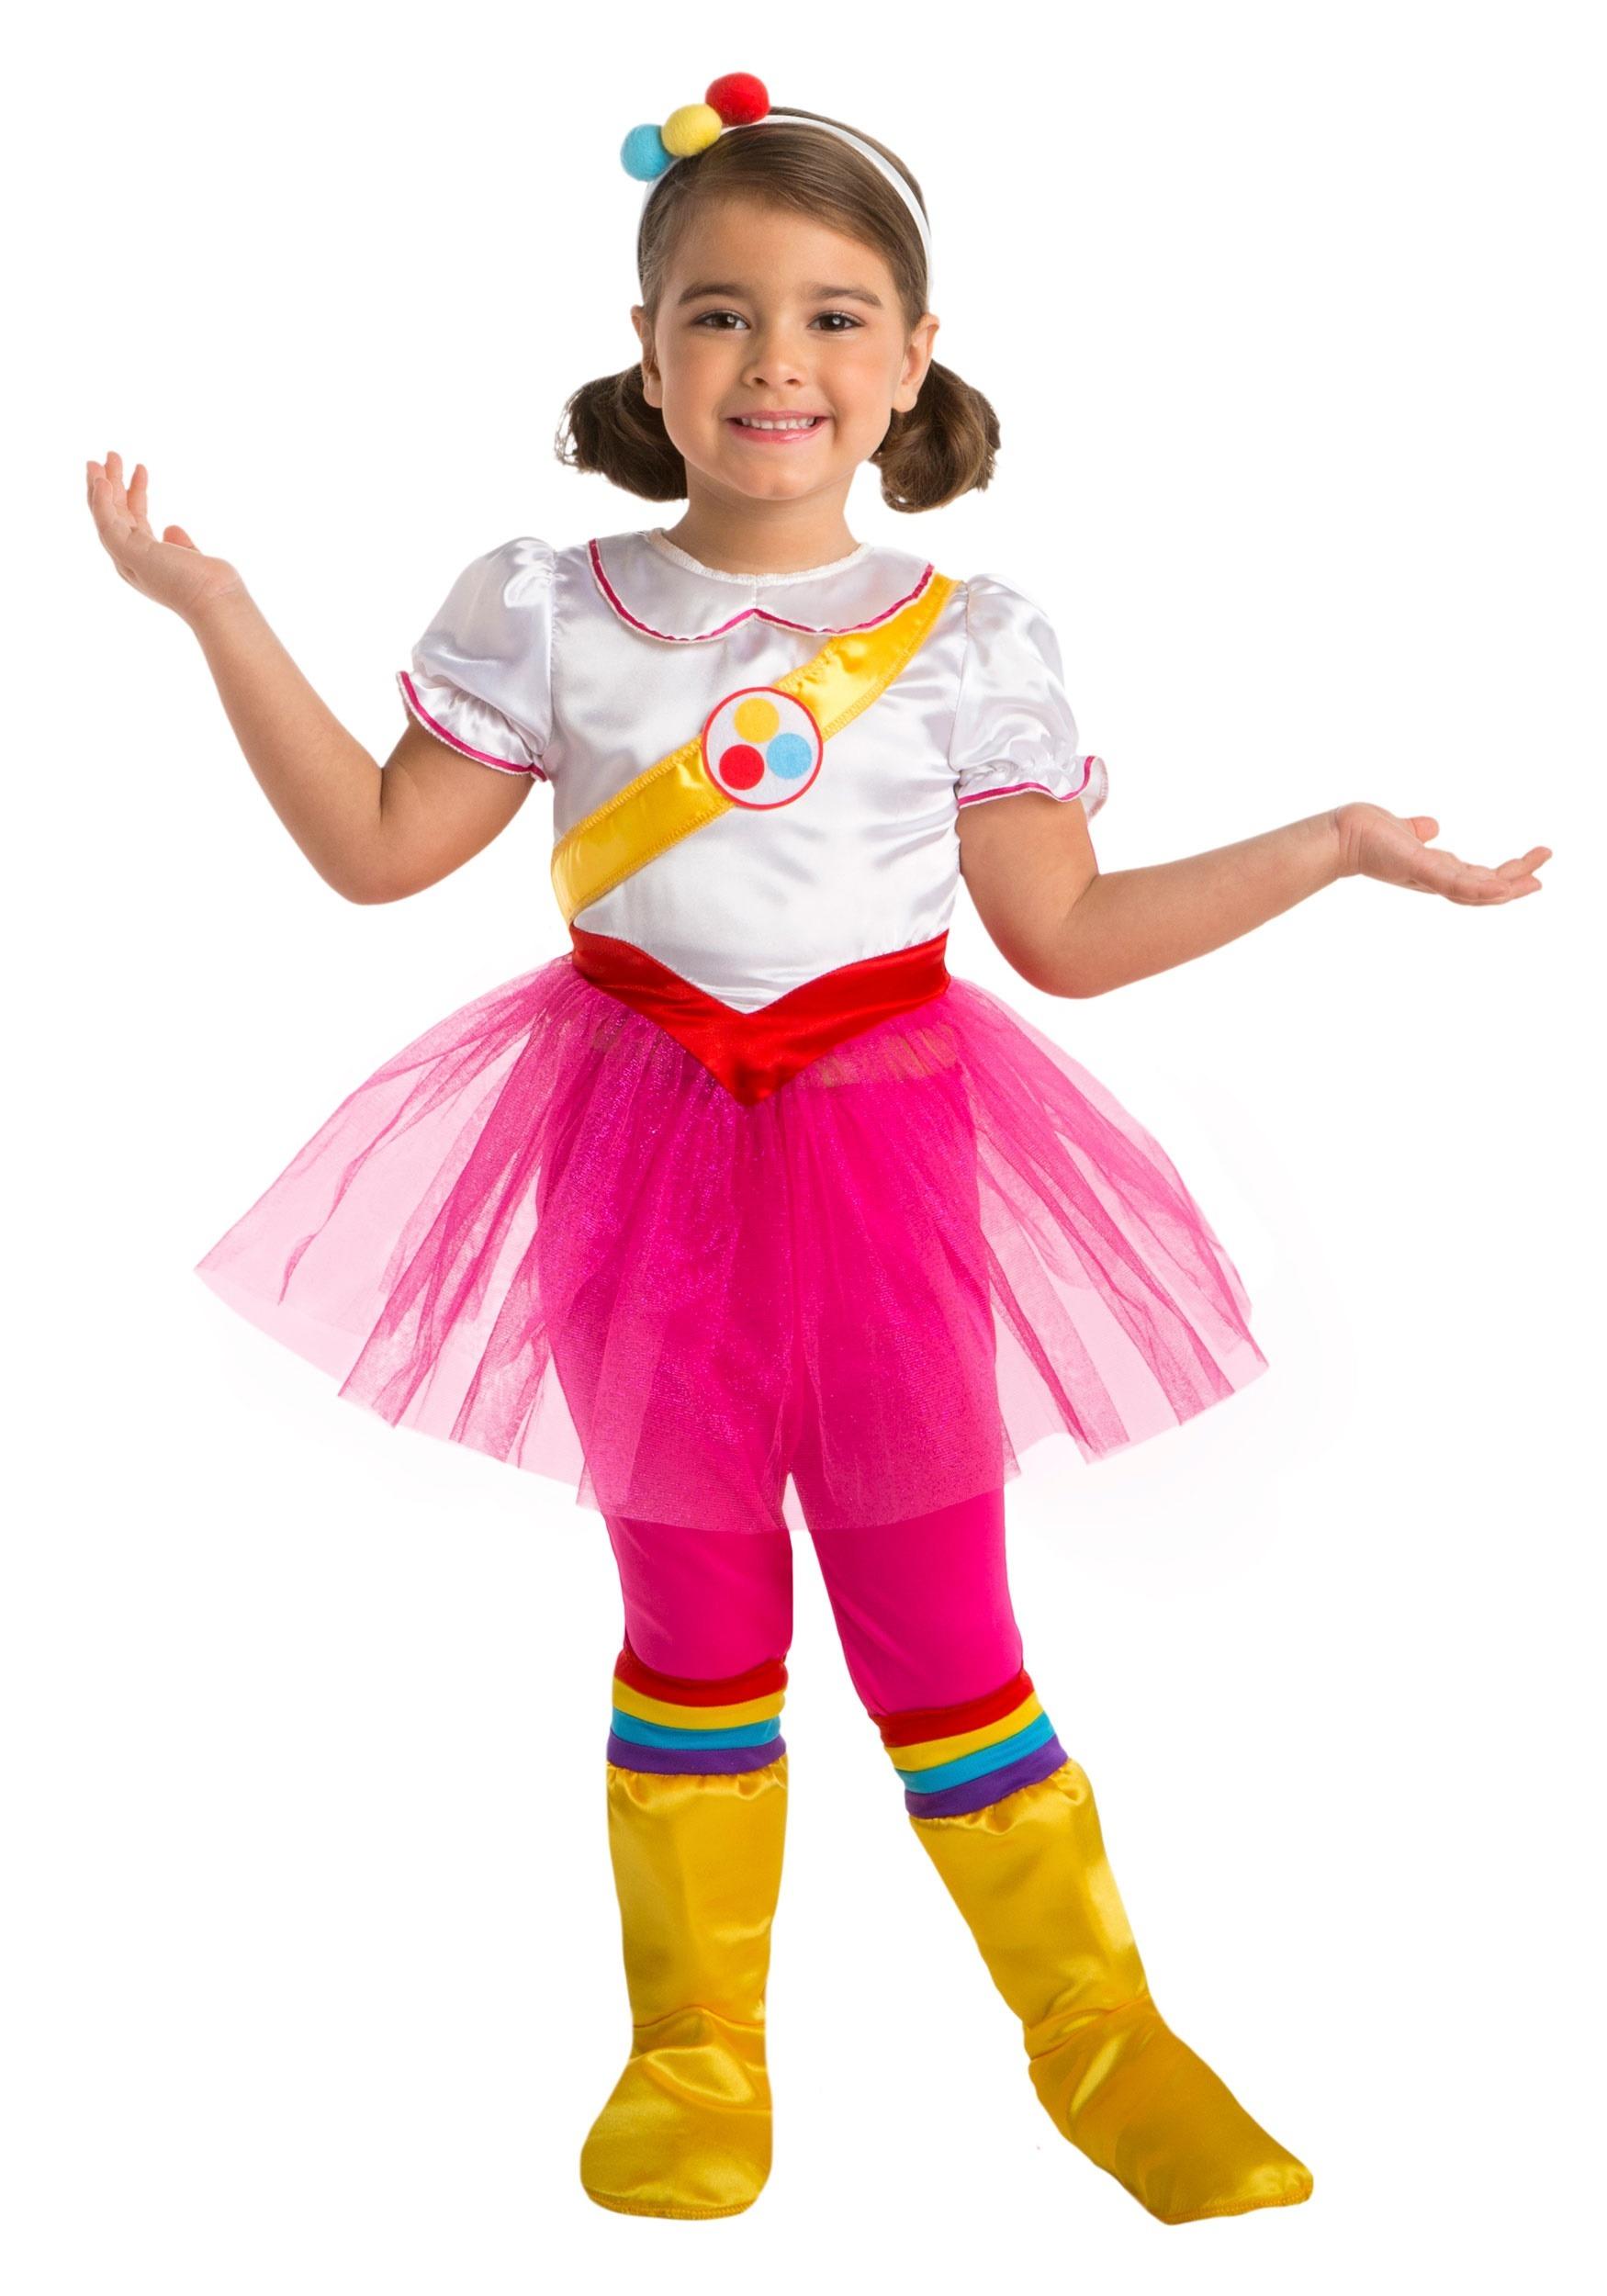 True and the Rainbow Kingdom Girlu0027s True Costume  sc 1 st  Halloween Costumes & Girlu0027s True Costume from True and the Rainbow Kingdom